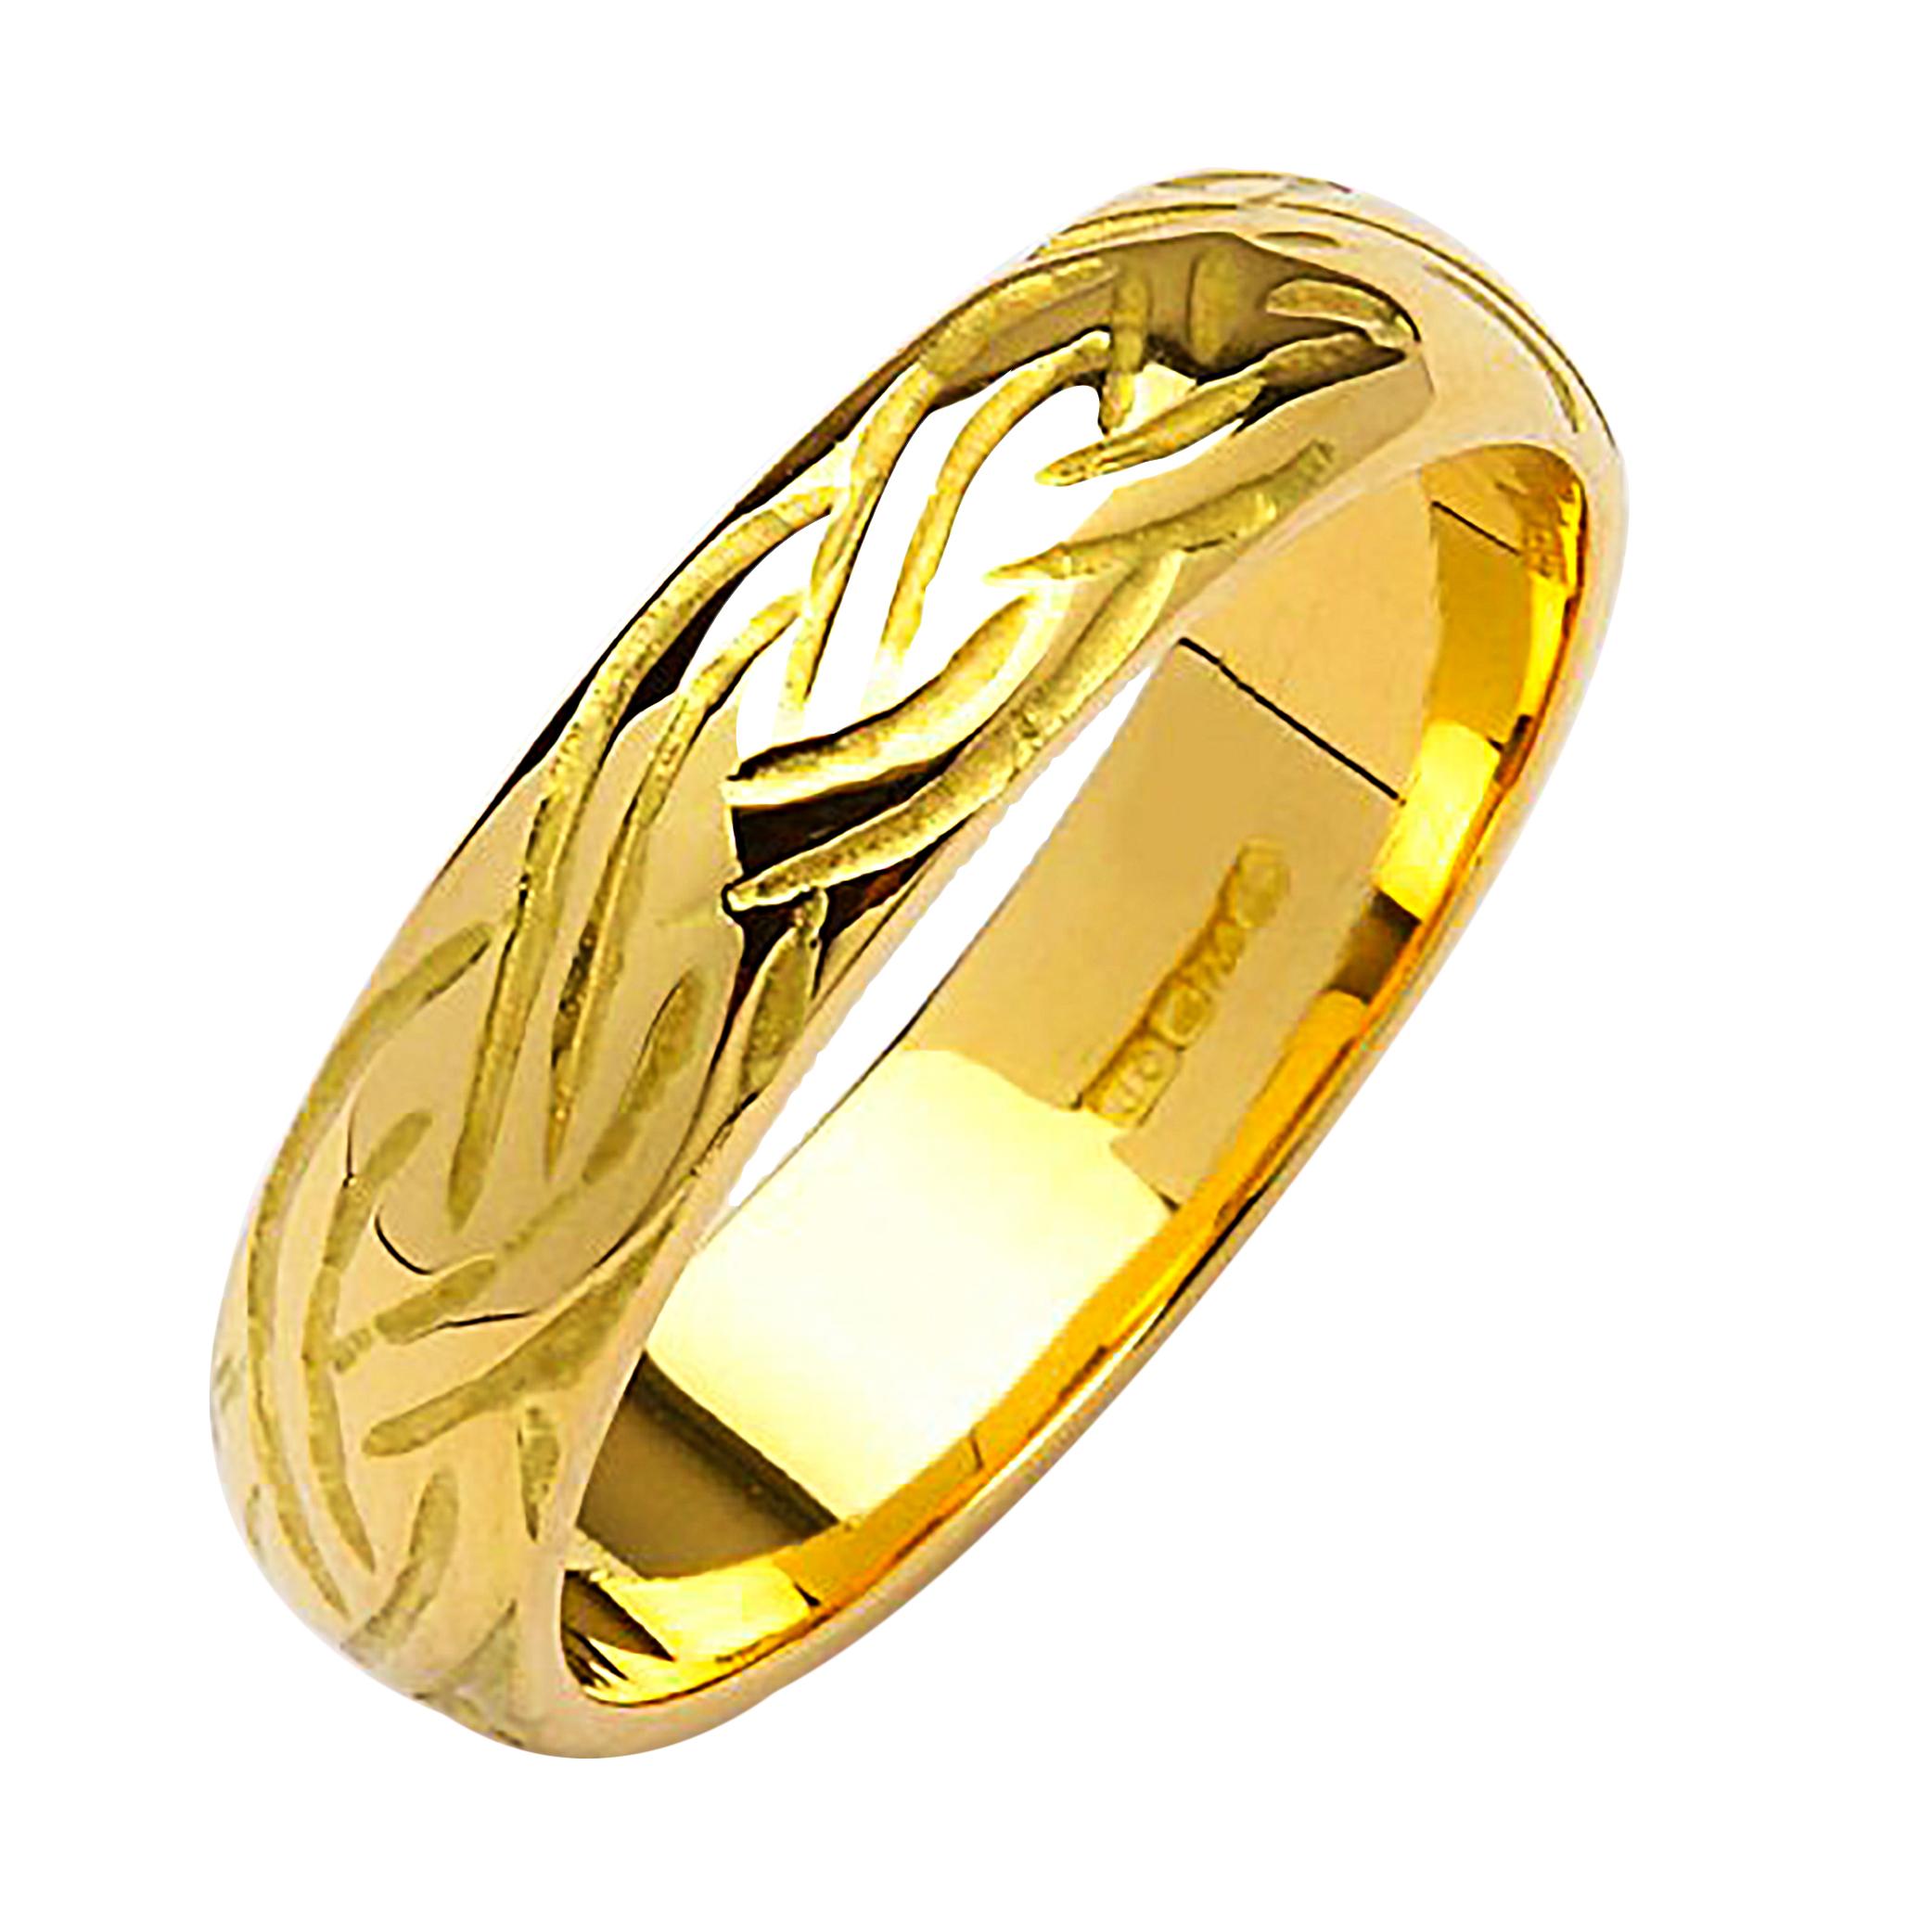 Fado Celtic Jewelry made in Ireland